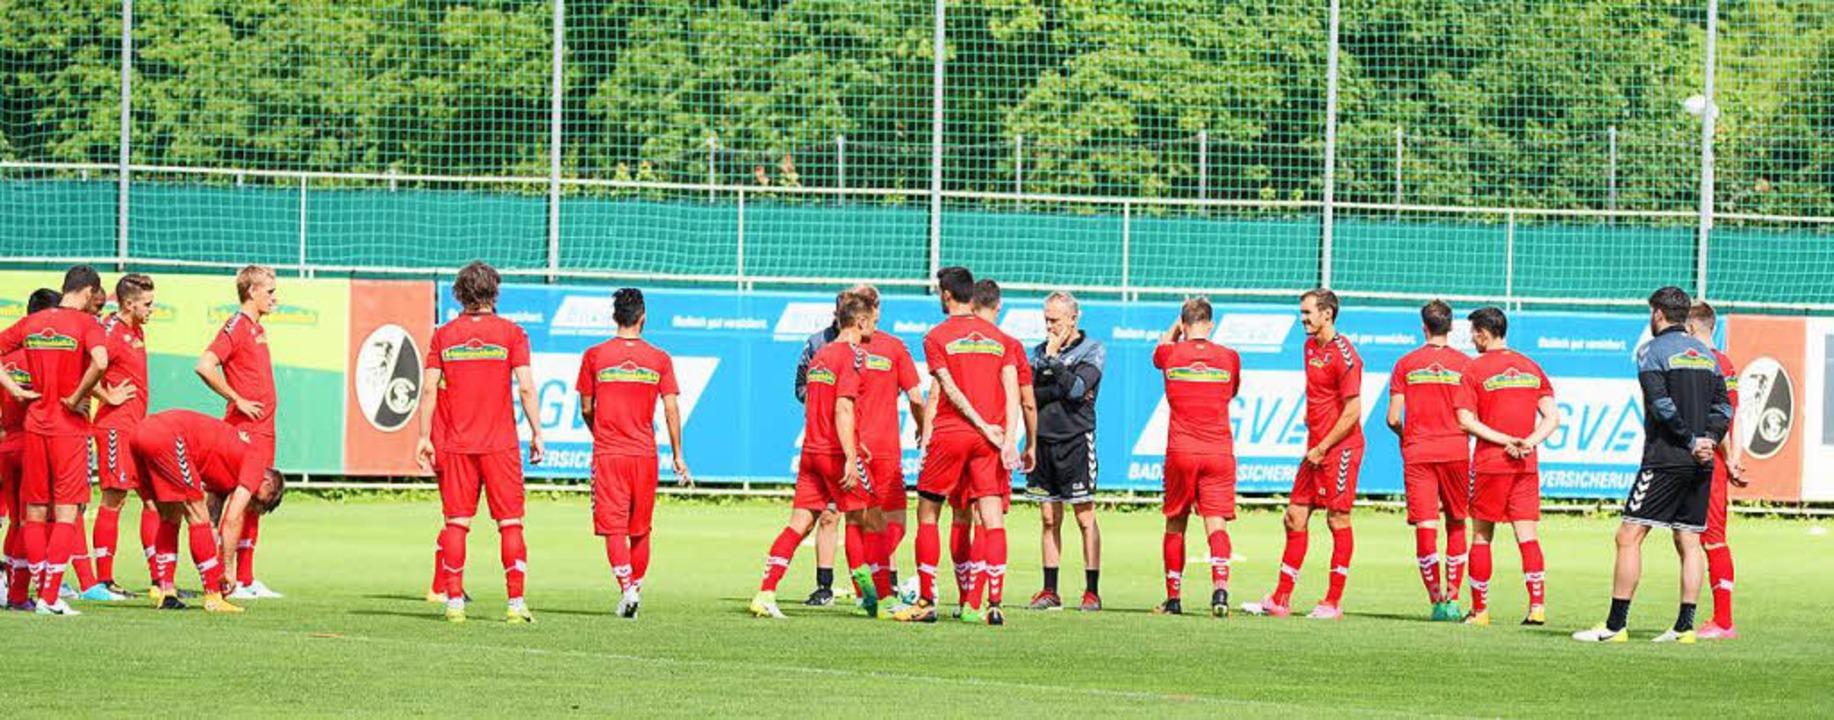 Trainingsauftakt beim SC Freiburg    Foto: Achim Keller